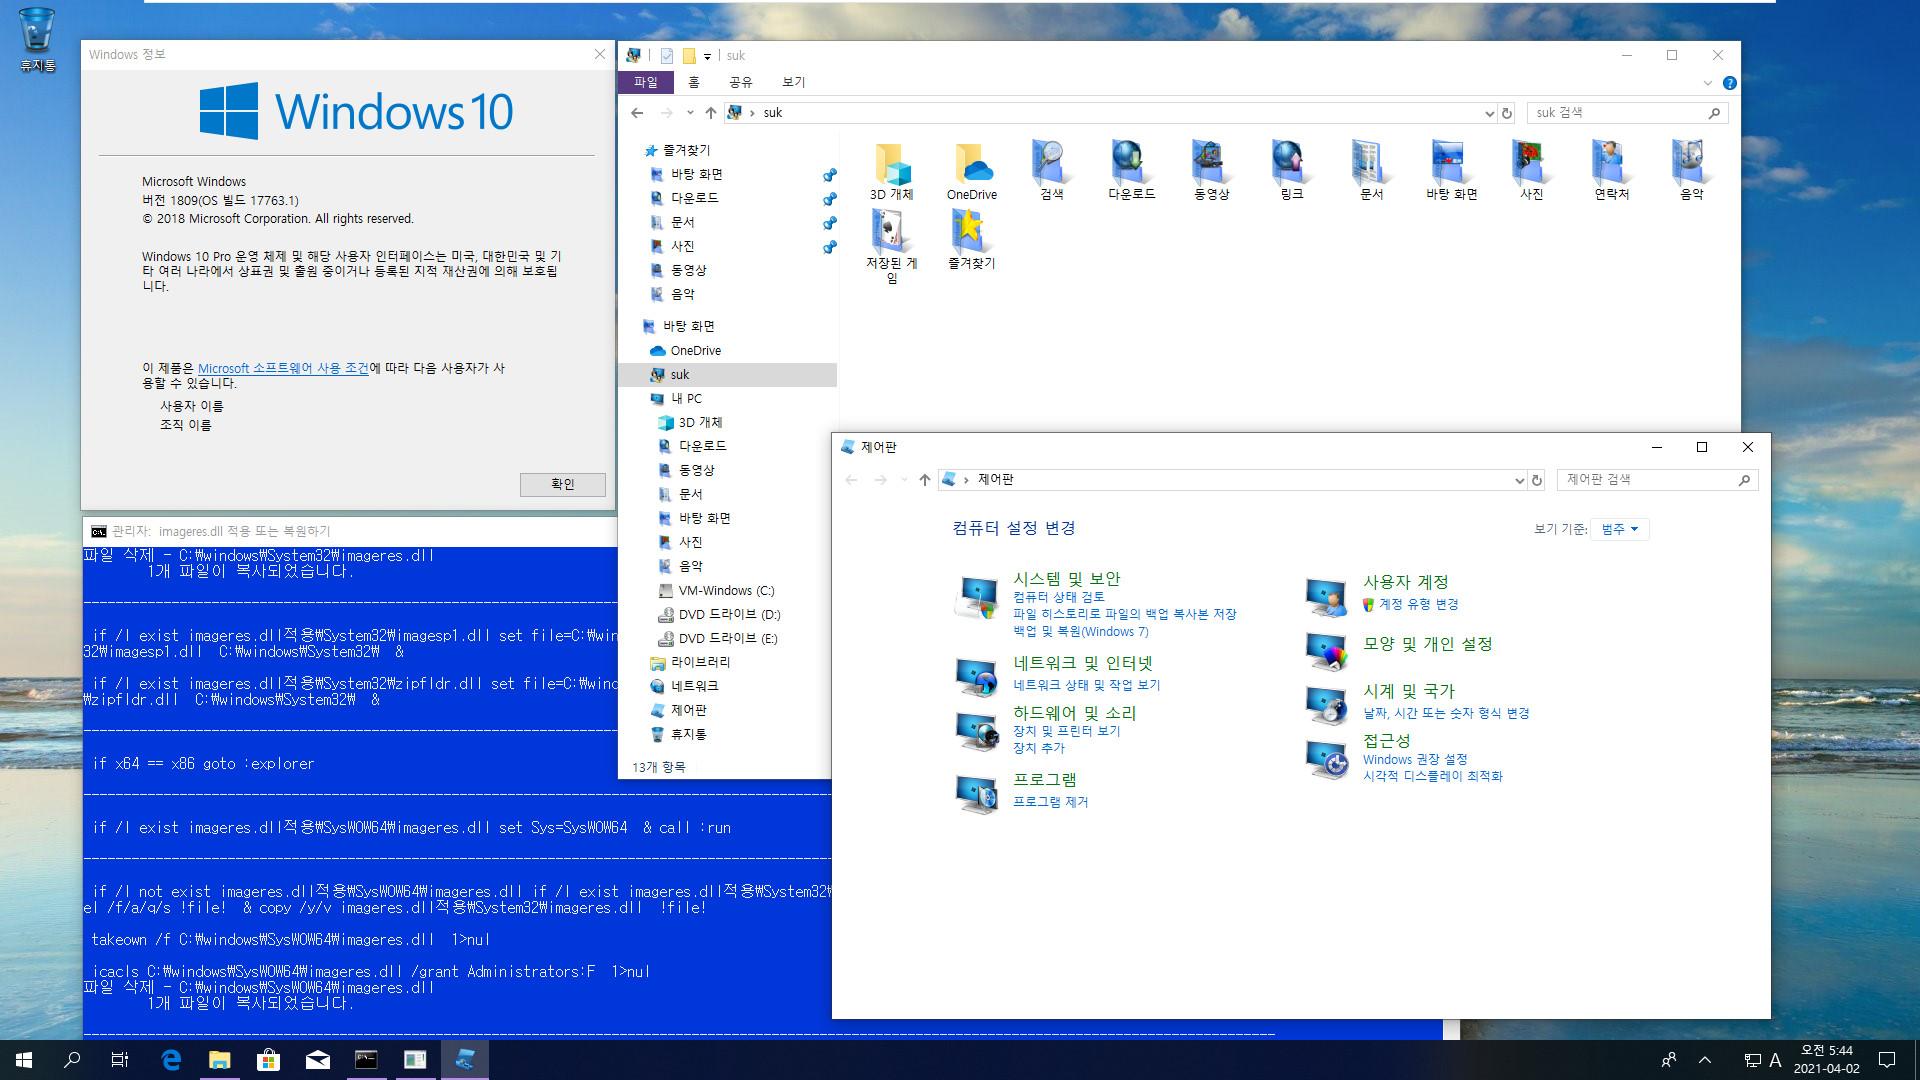 imageres.dll 적용하면 부팅이 안 되는 윈도우는 imageres.dll 2개를 합치면 부팅 됩니다 2021-04-02_054405.jpg